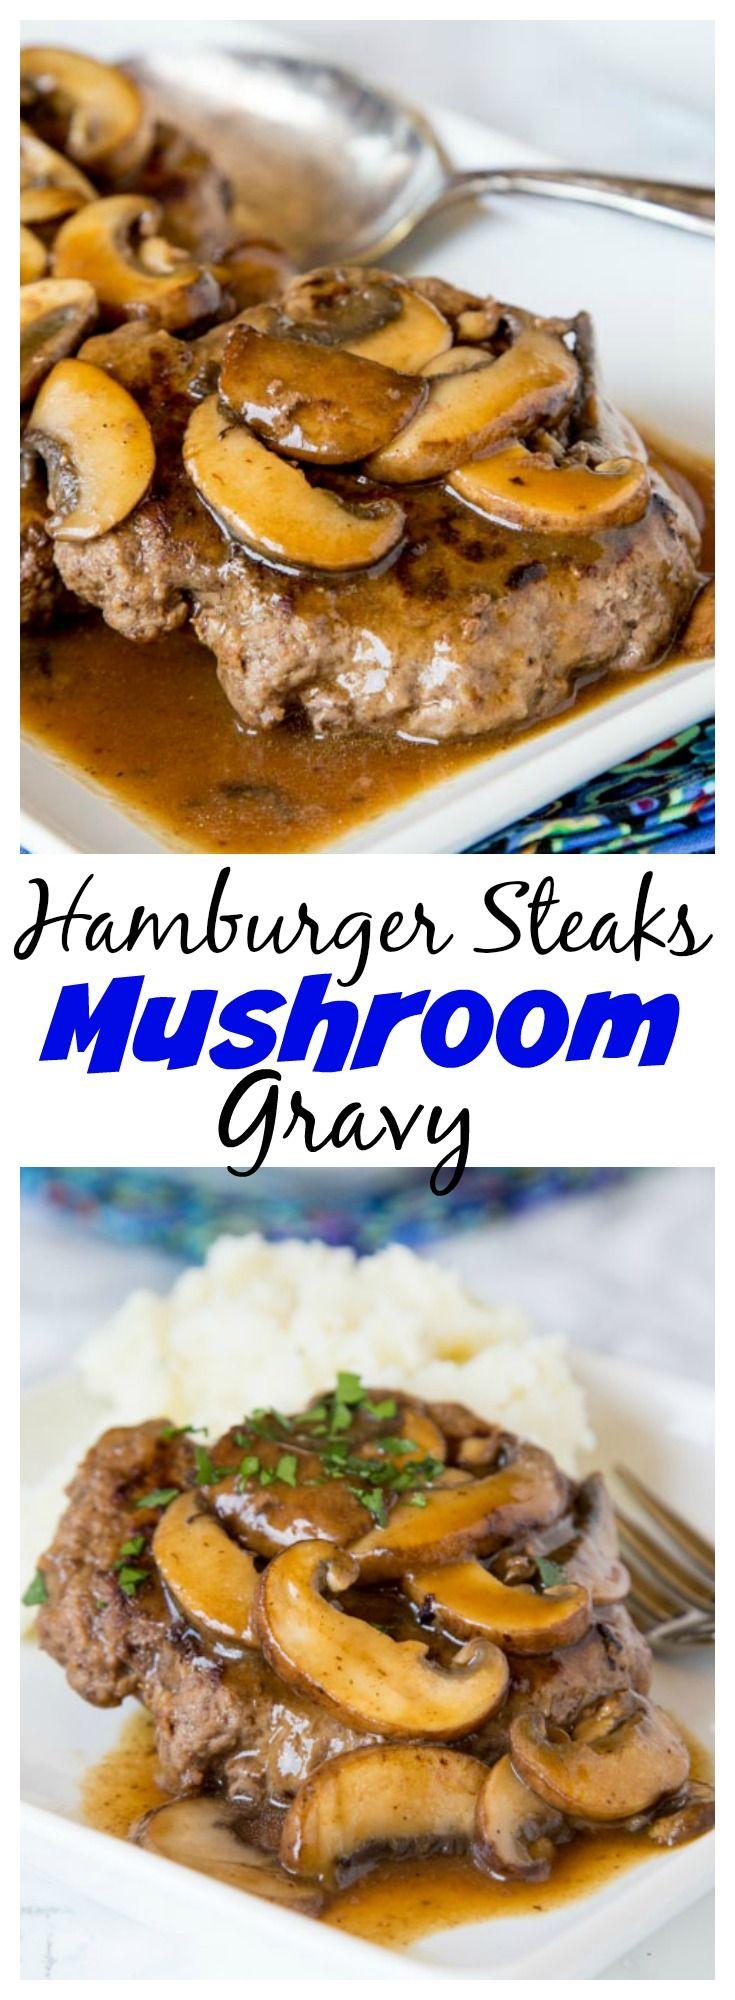 Hamburger Steaks with Mushroom Gravy -easy comfort food that won't break the bank! Rich mushroom gravy over tender hamburger steaks is a great weeknight dinner.